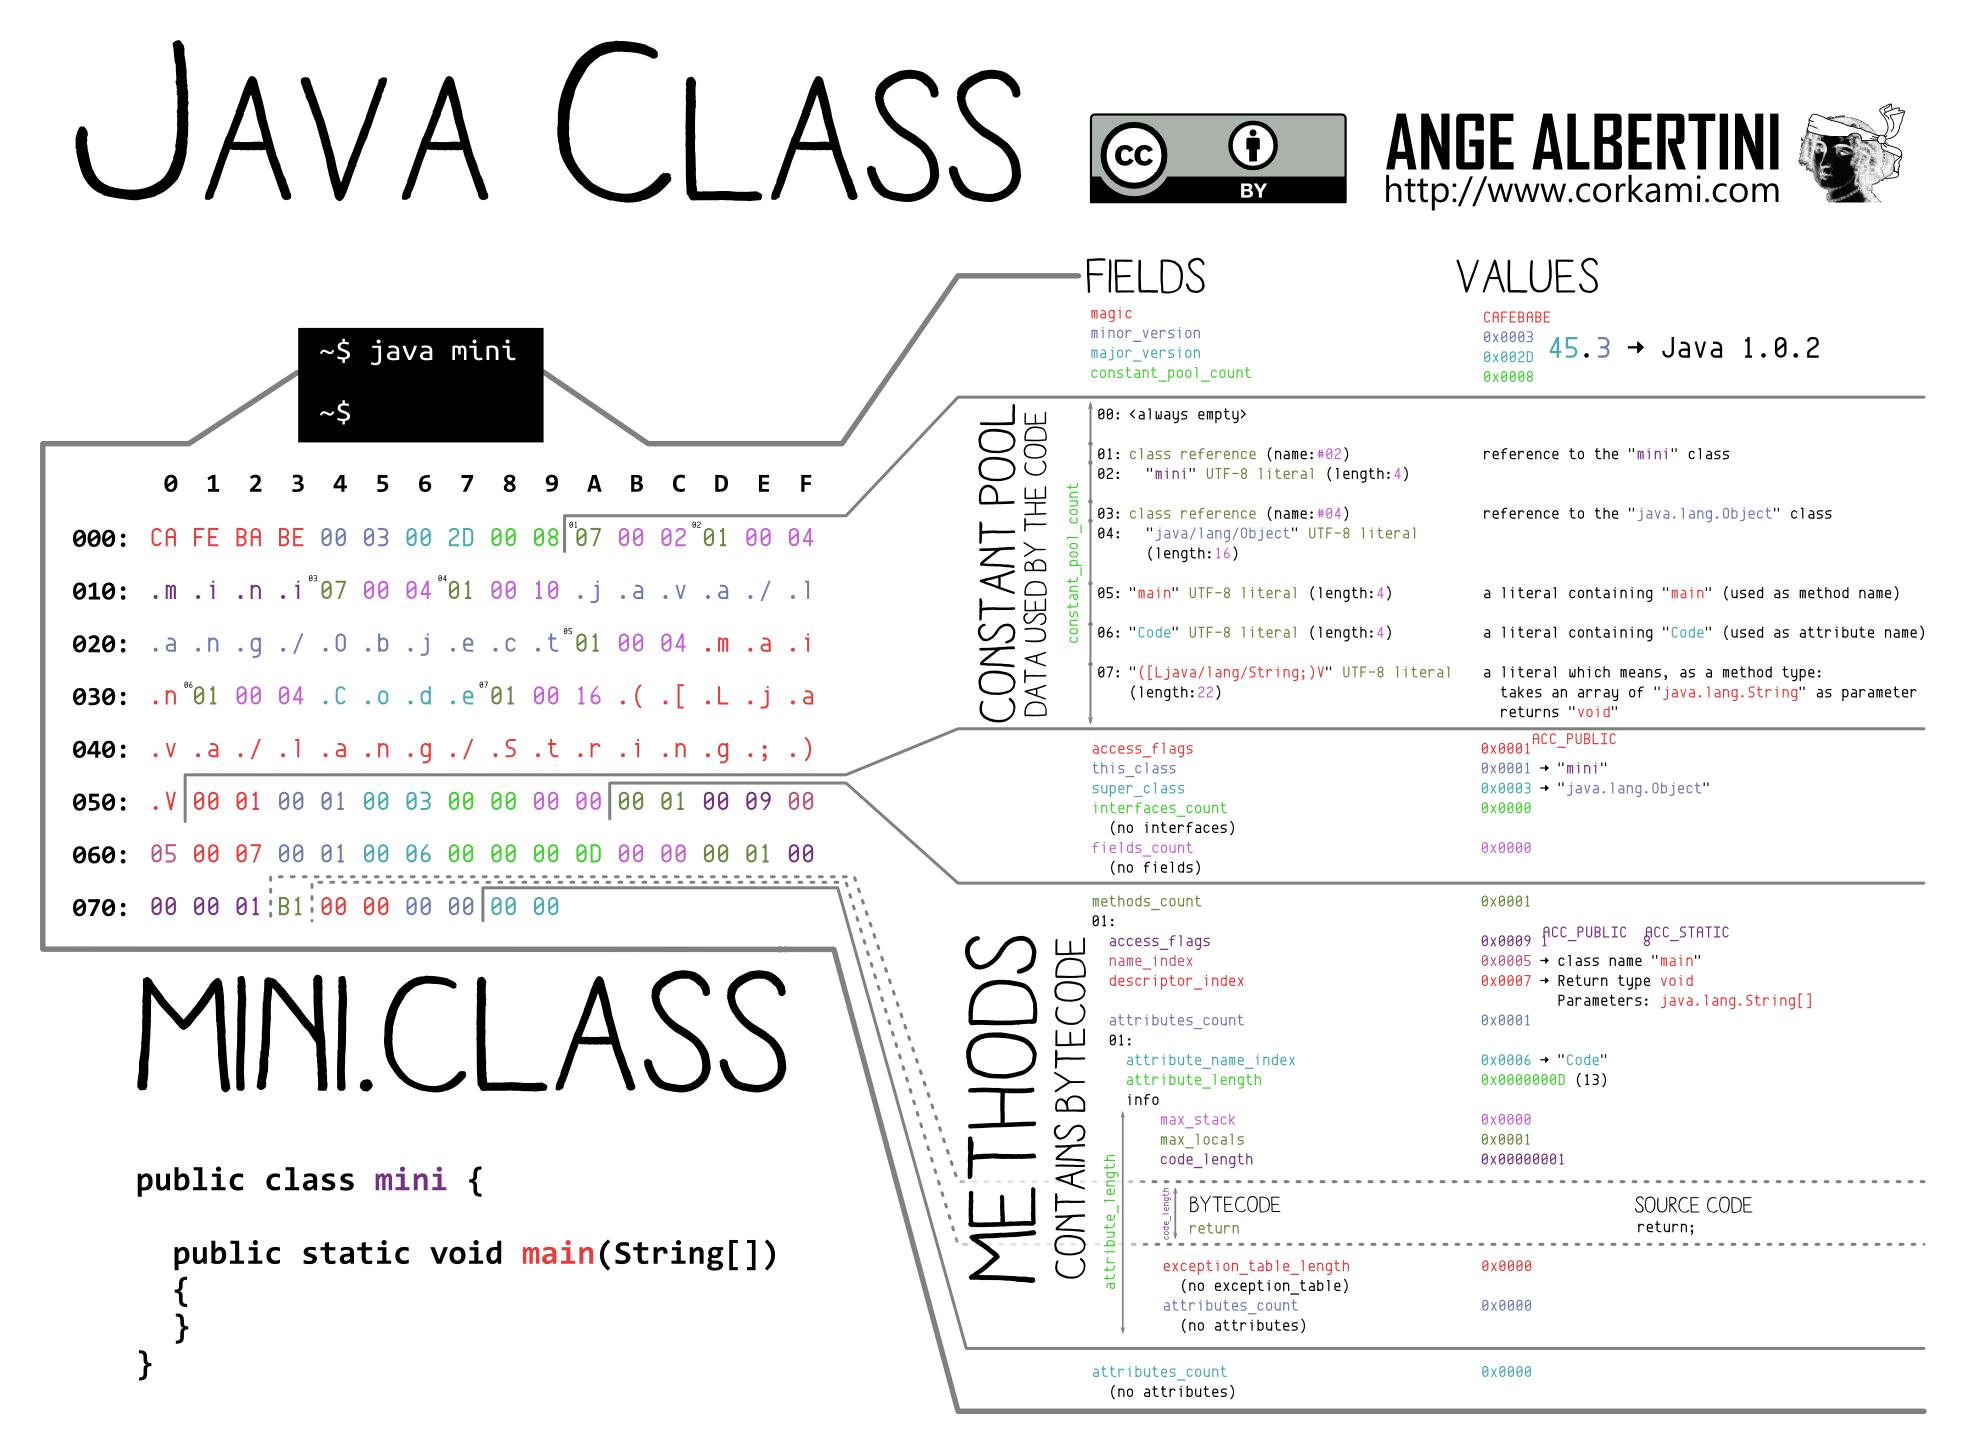 a Java Class file